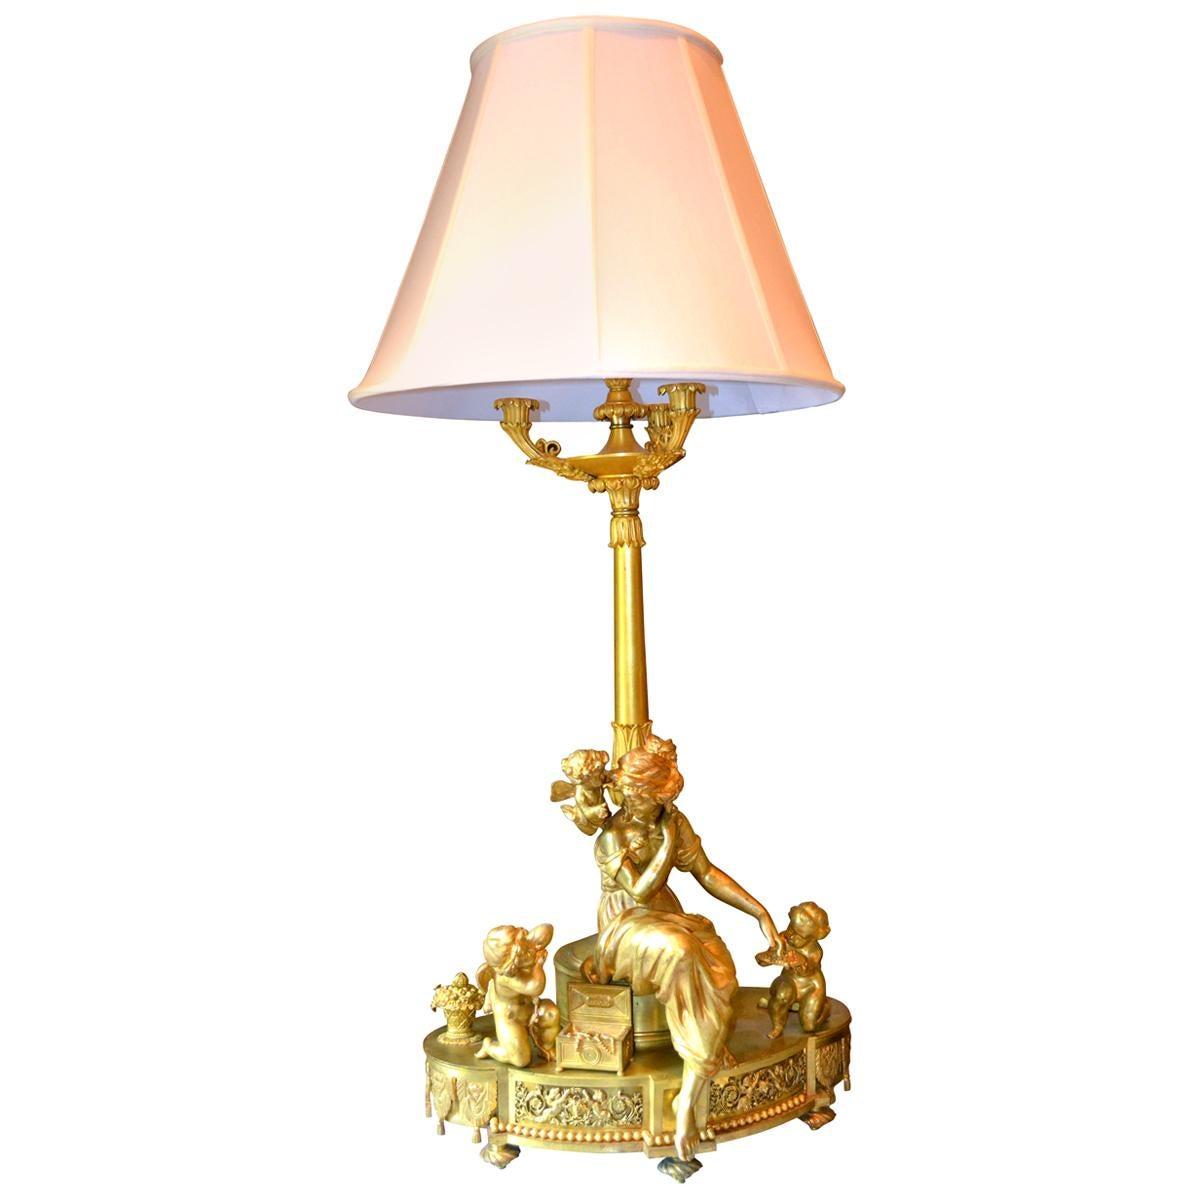 Large Louis XVI Style Gilt Bronze Figural Lamp